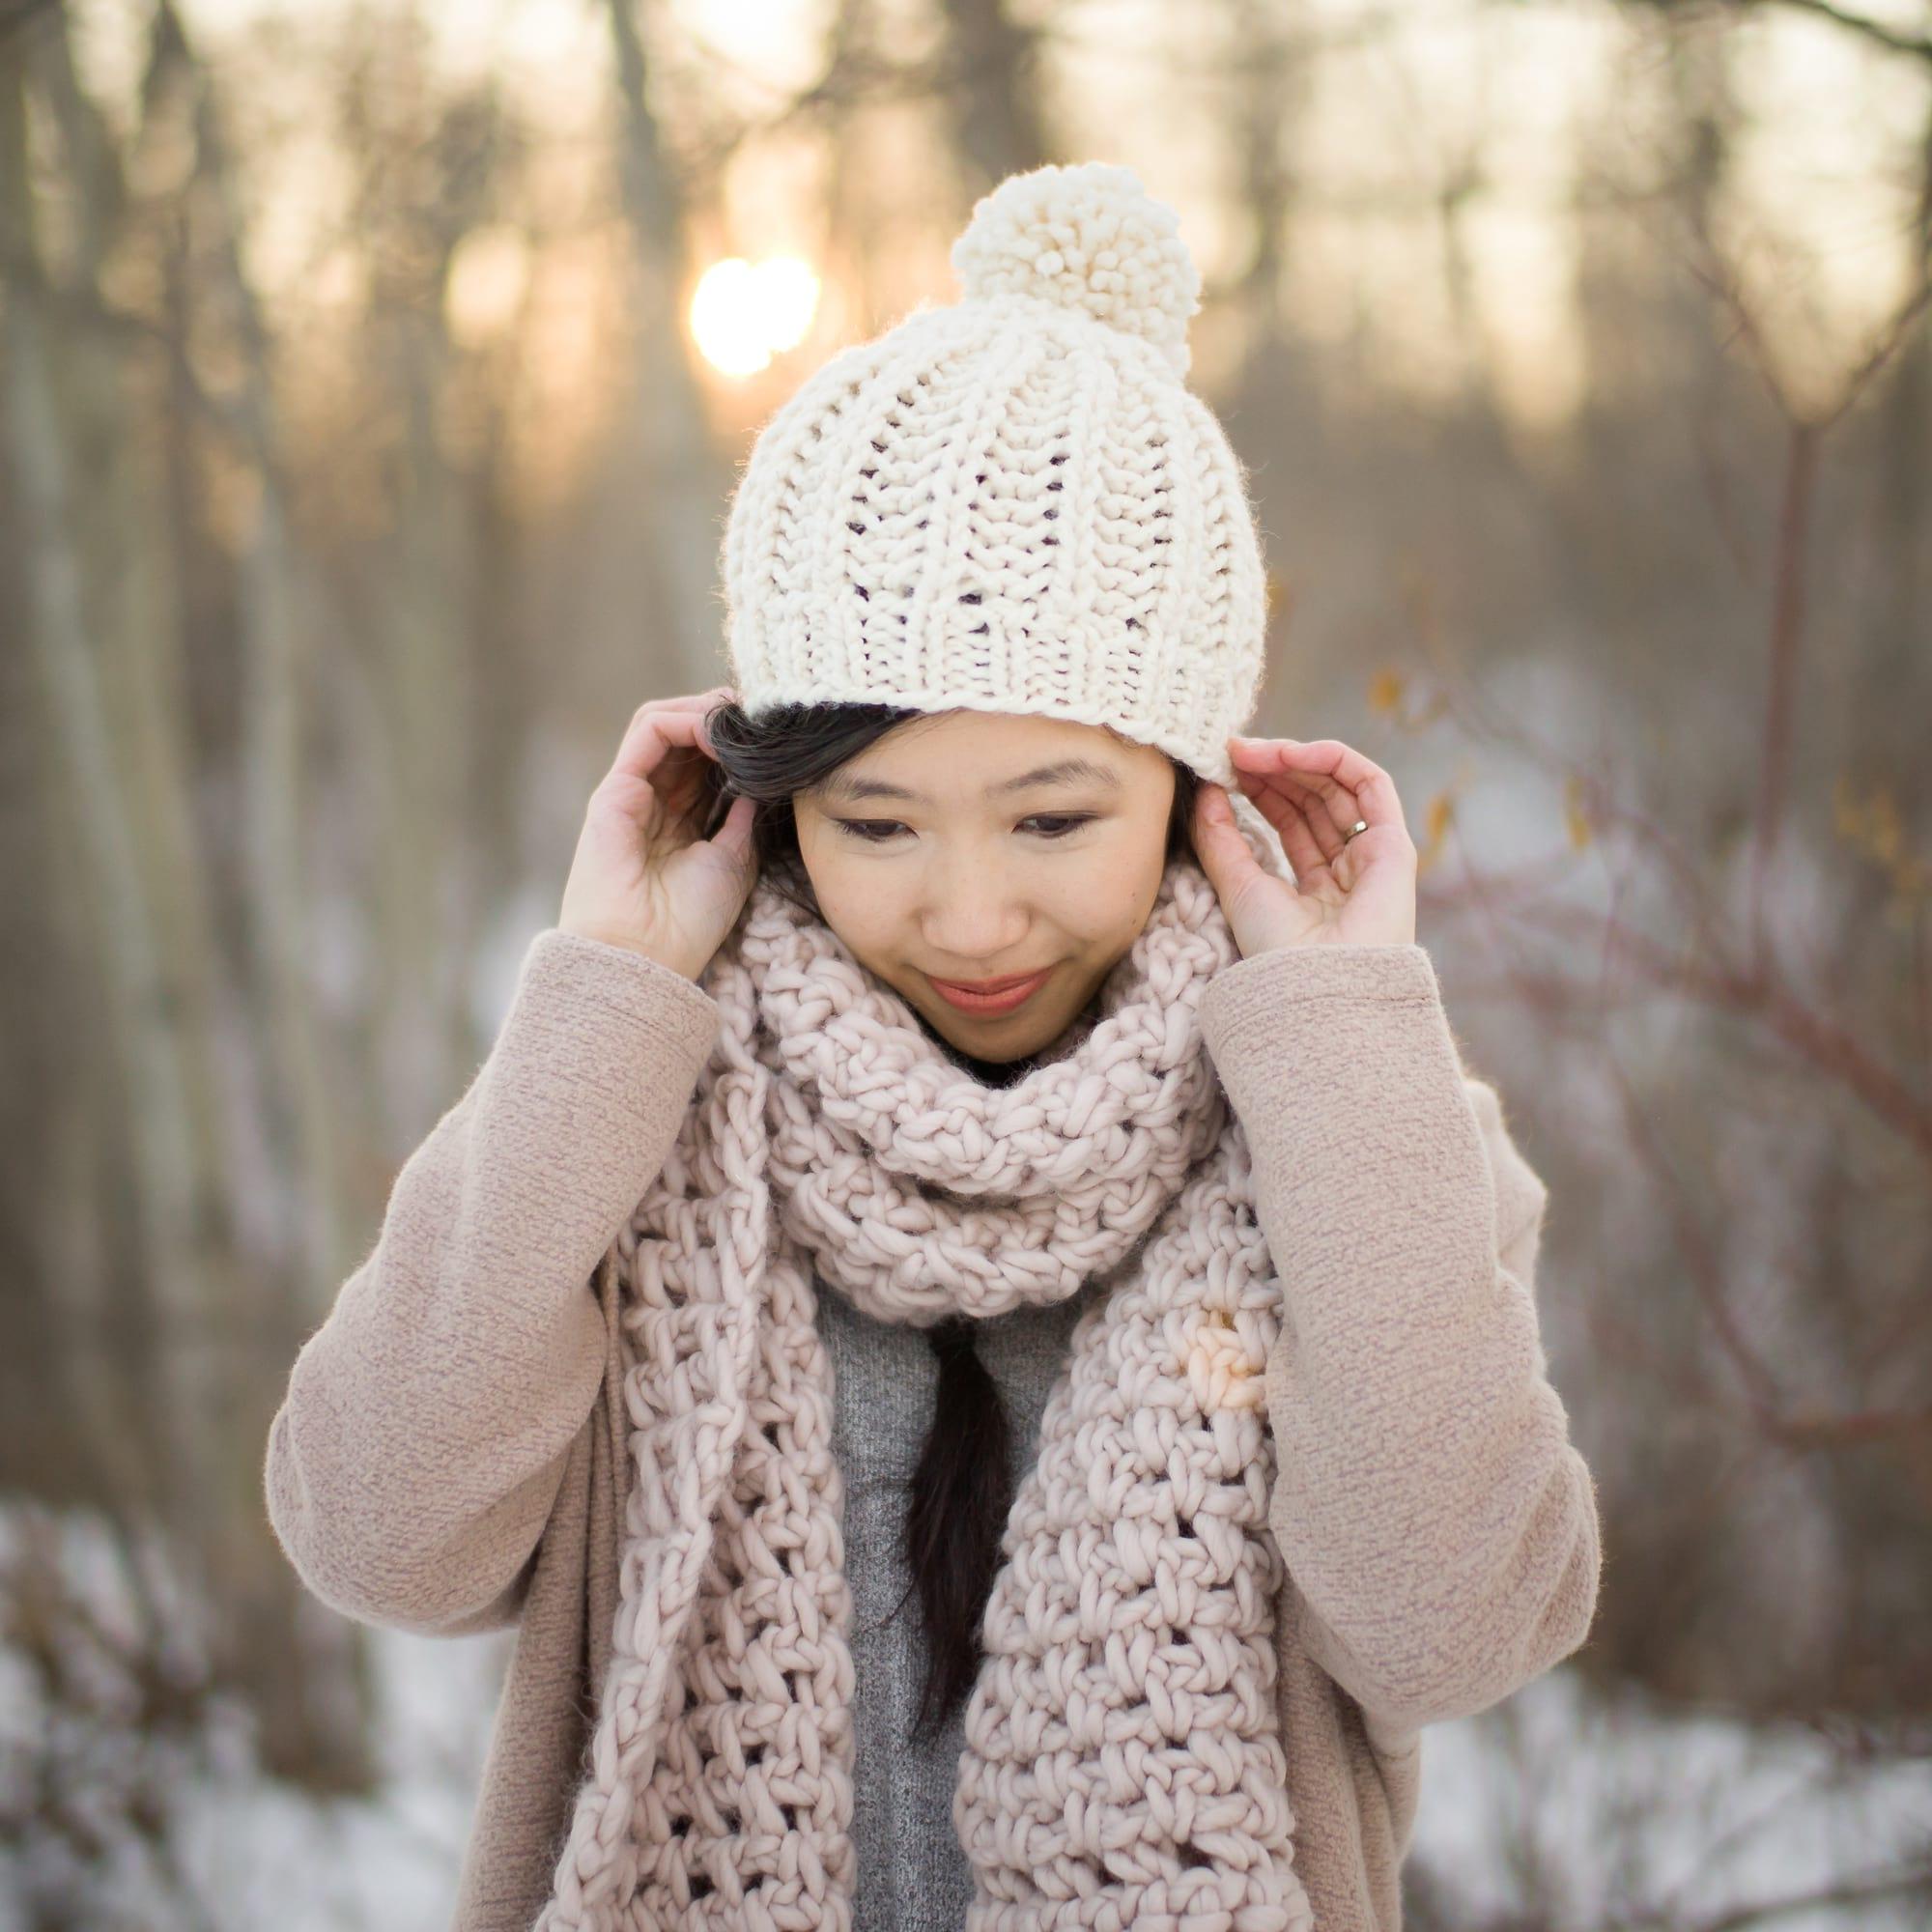 Knit Fisherman\'s Rib Hat - All About Ami